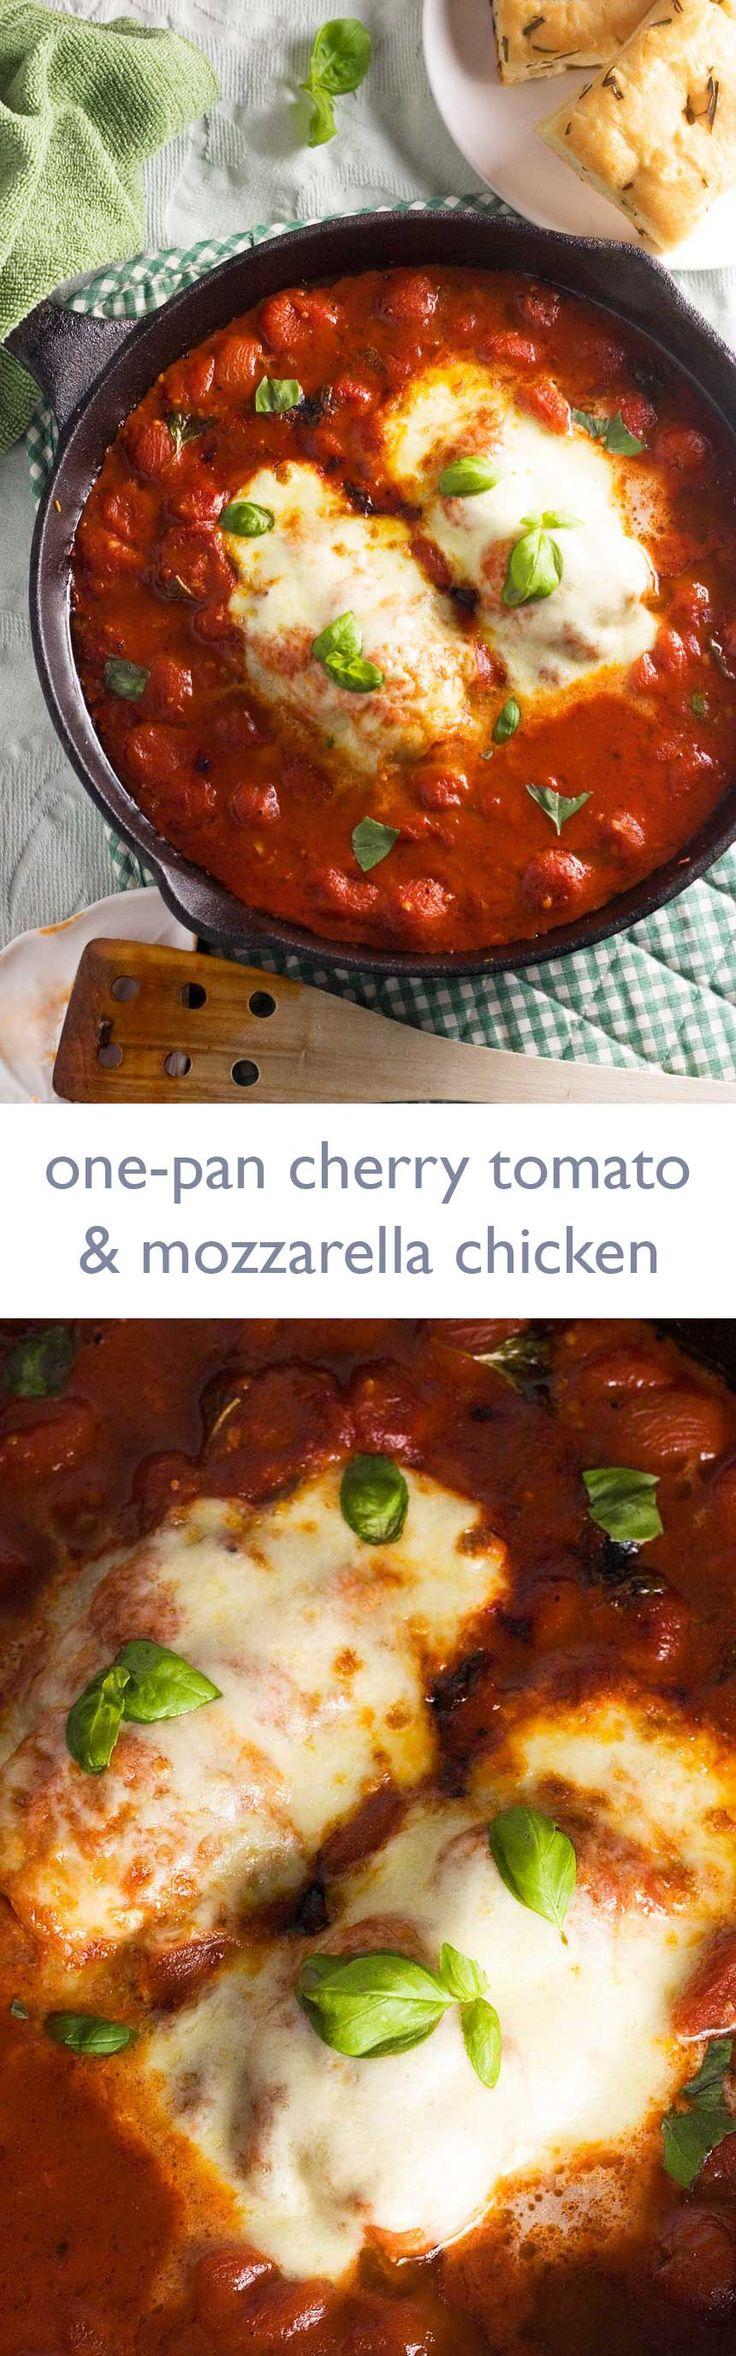 One-pan cherry tomato and mozzarella chicken